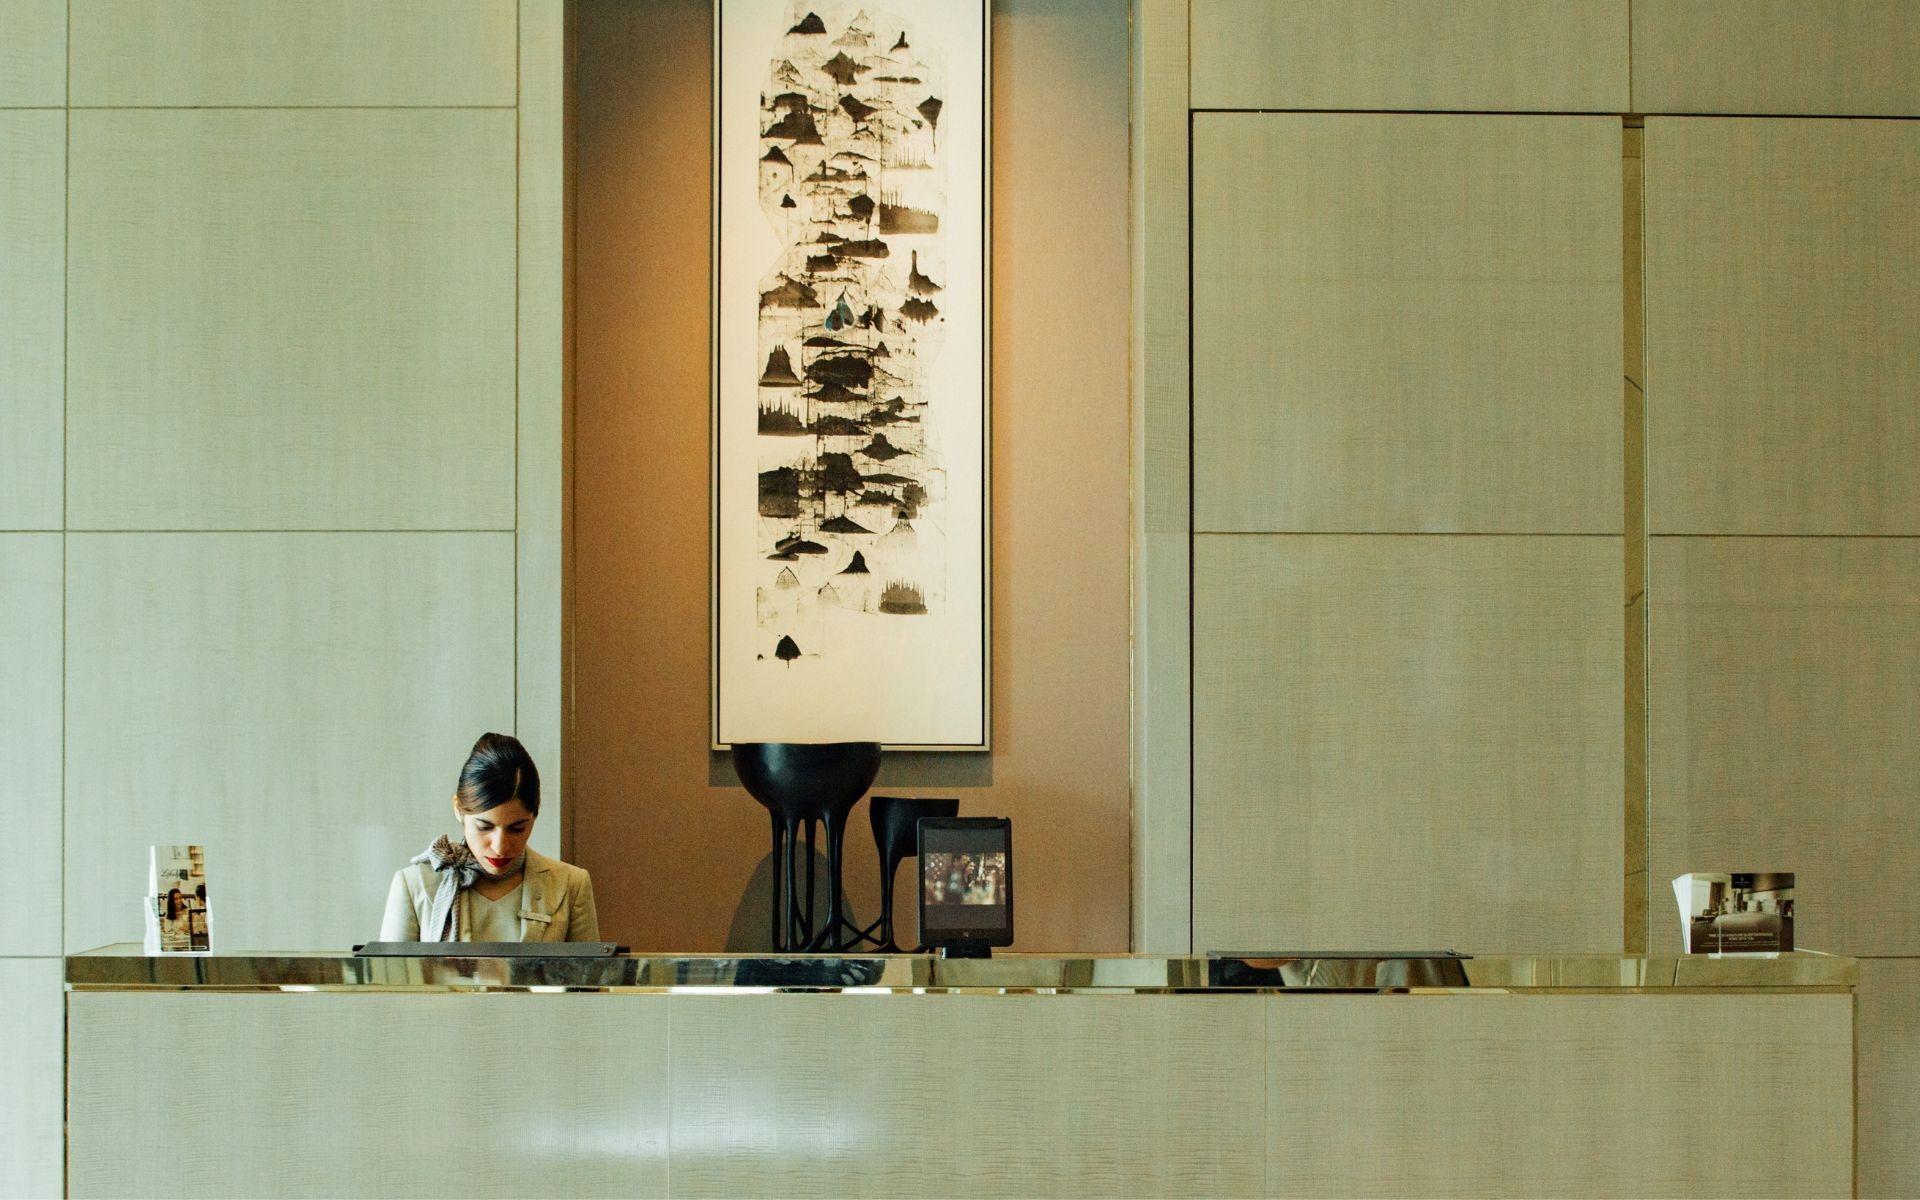 3 Fine Attributes Of The Four Seasons Hotel Kuala Lumpur